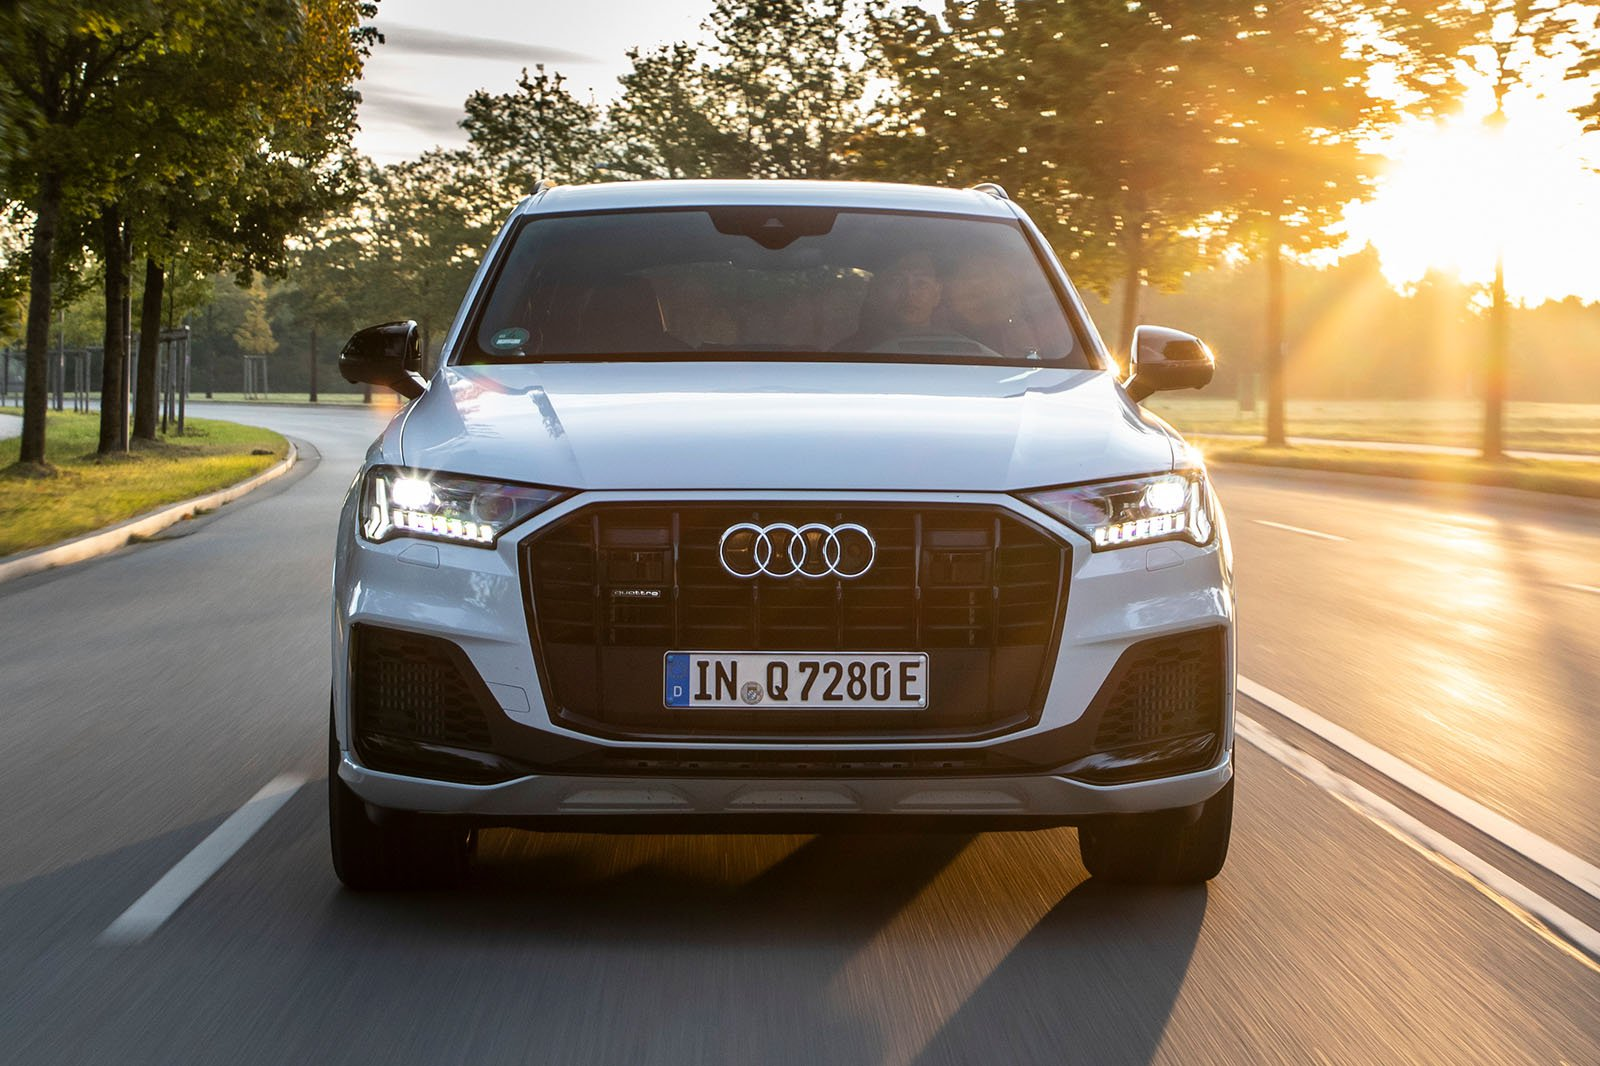 2020 Audi Q7 60 TFSIe driving